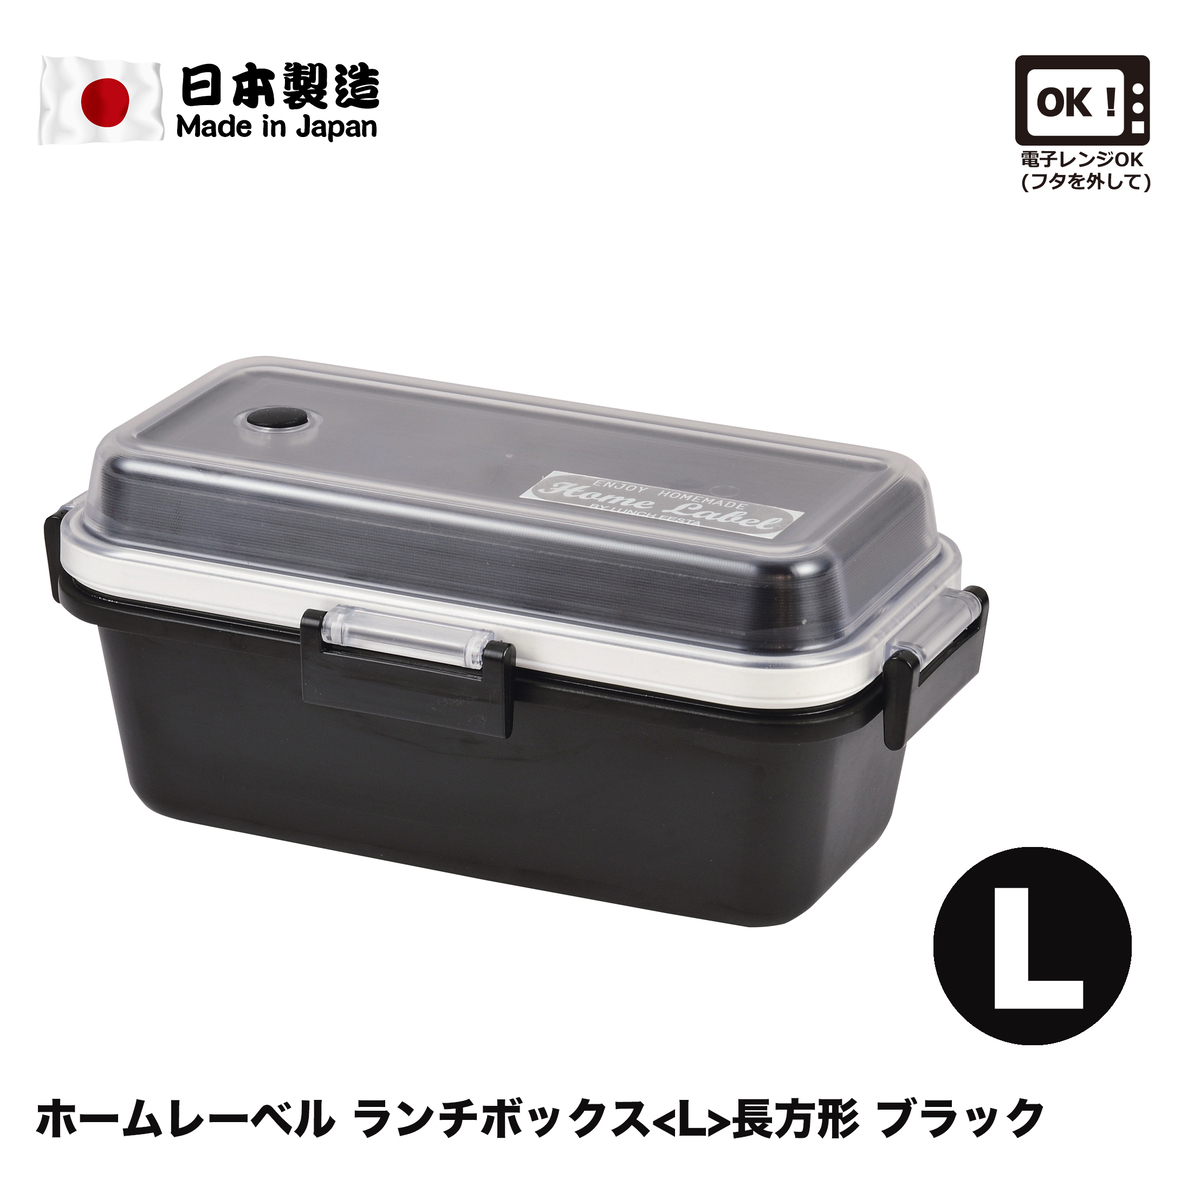 D-439 Lunch box L - BK